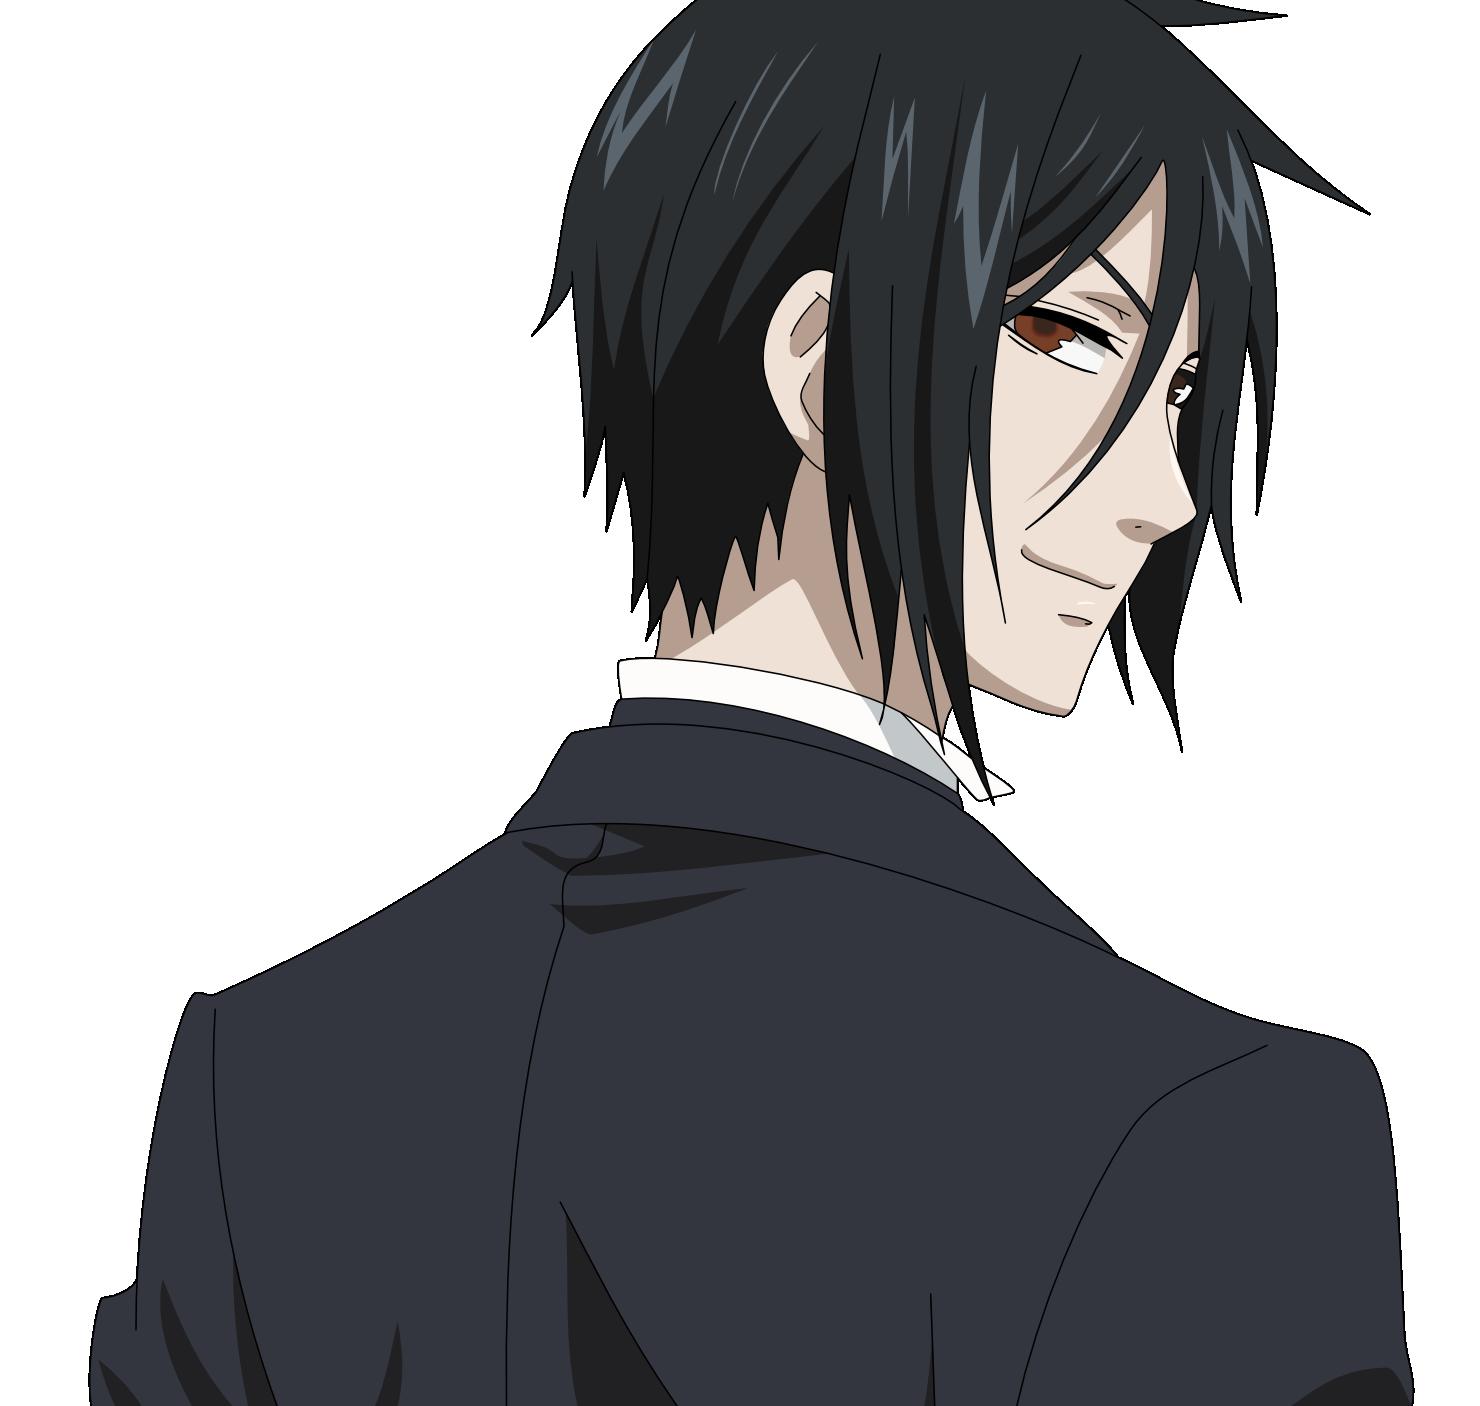 Her Butler, Creation Kuroshitsuji___Sebastian_by_adoroloble